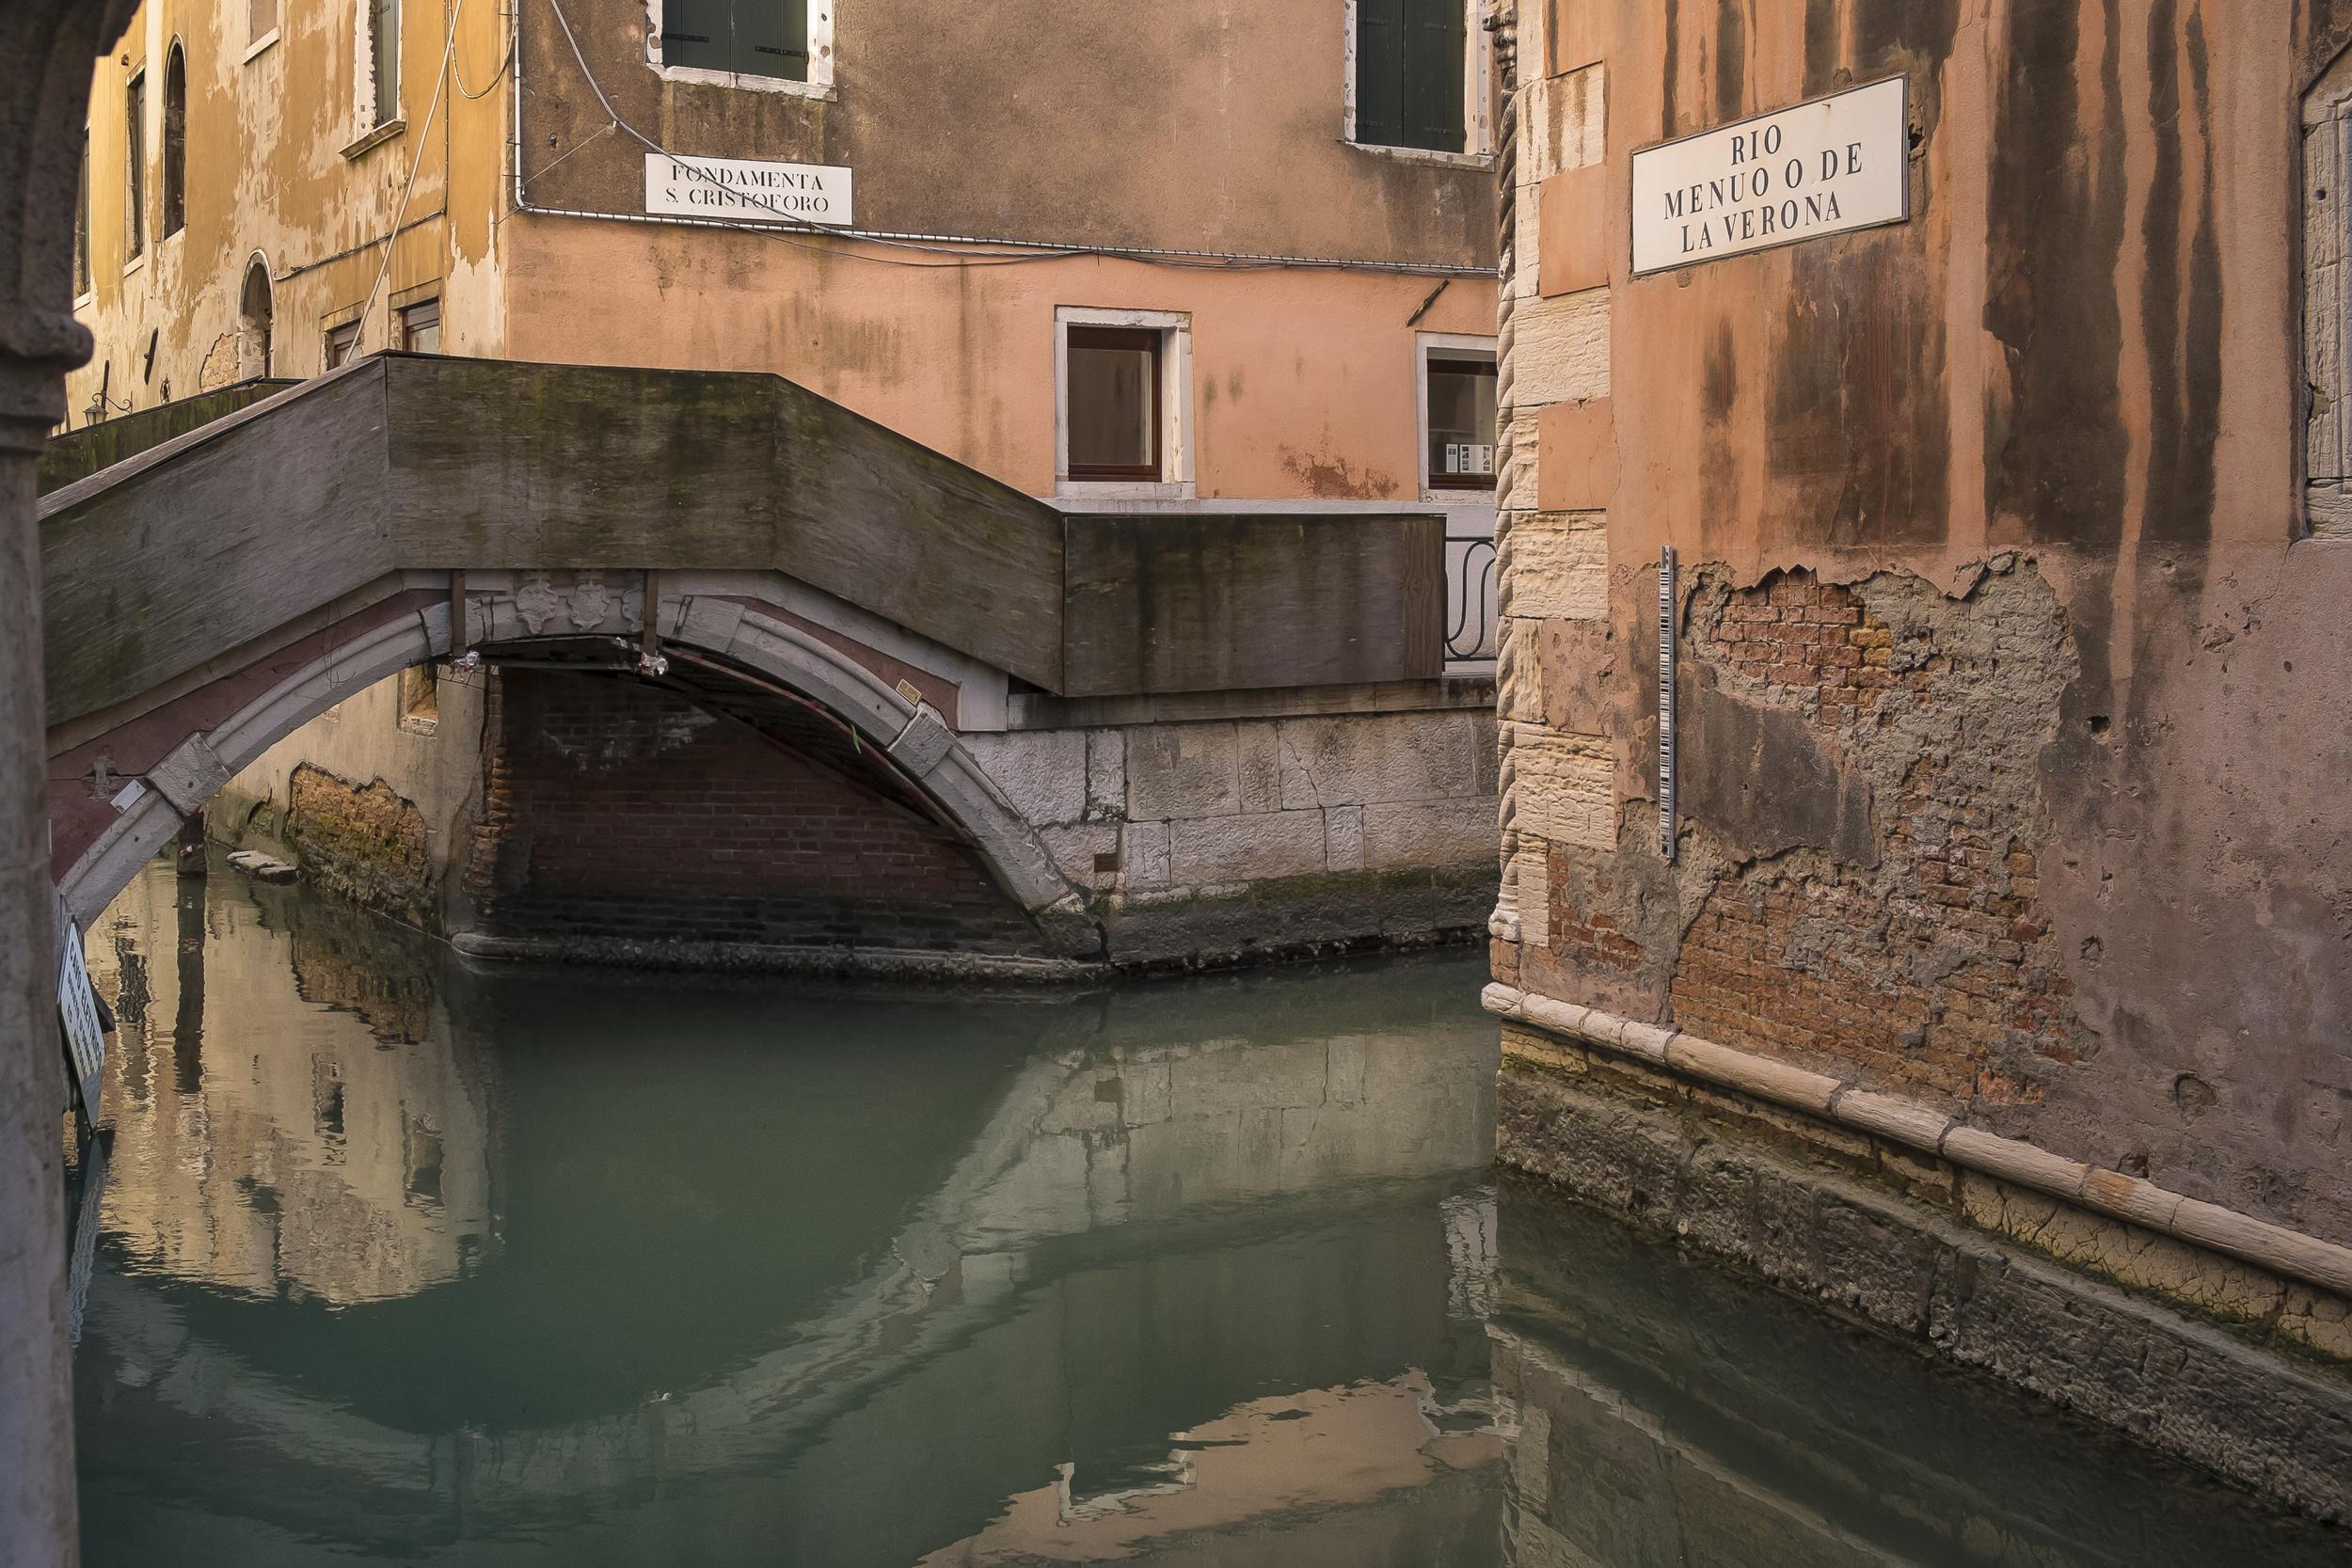 Venice-RioMenuo-20140525-DSCF6334.jpg